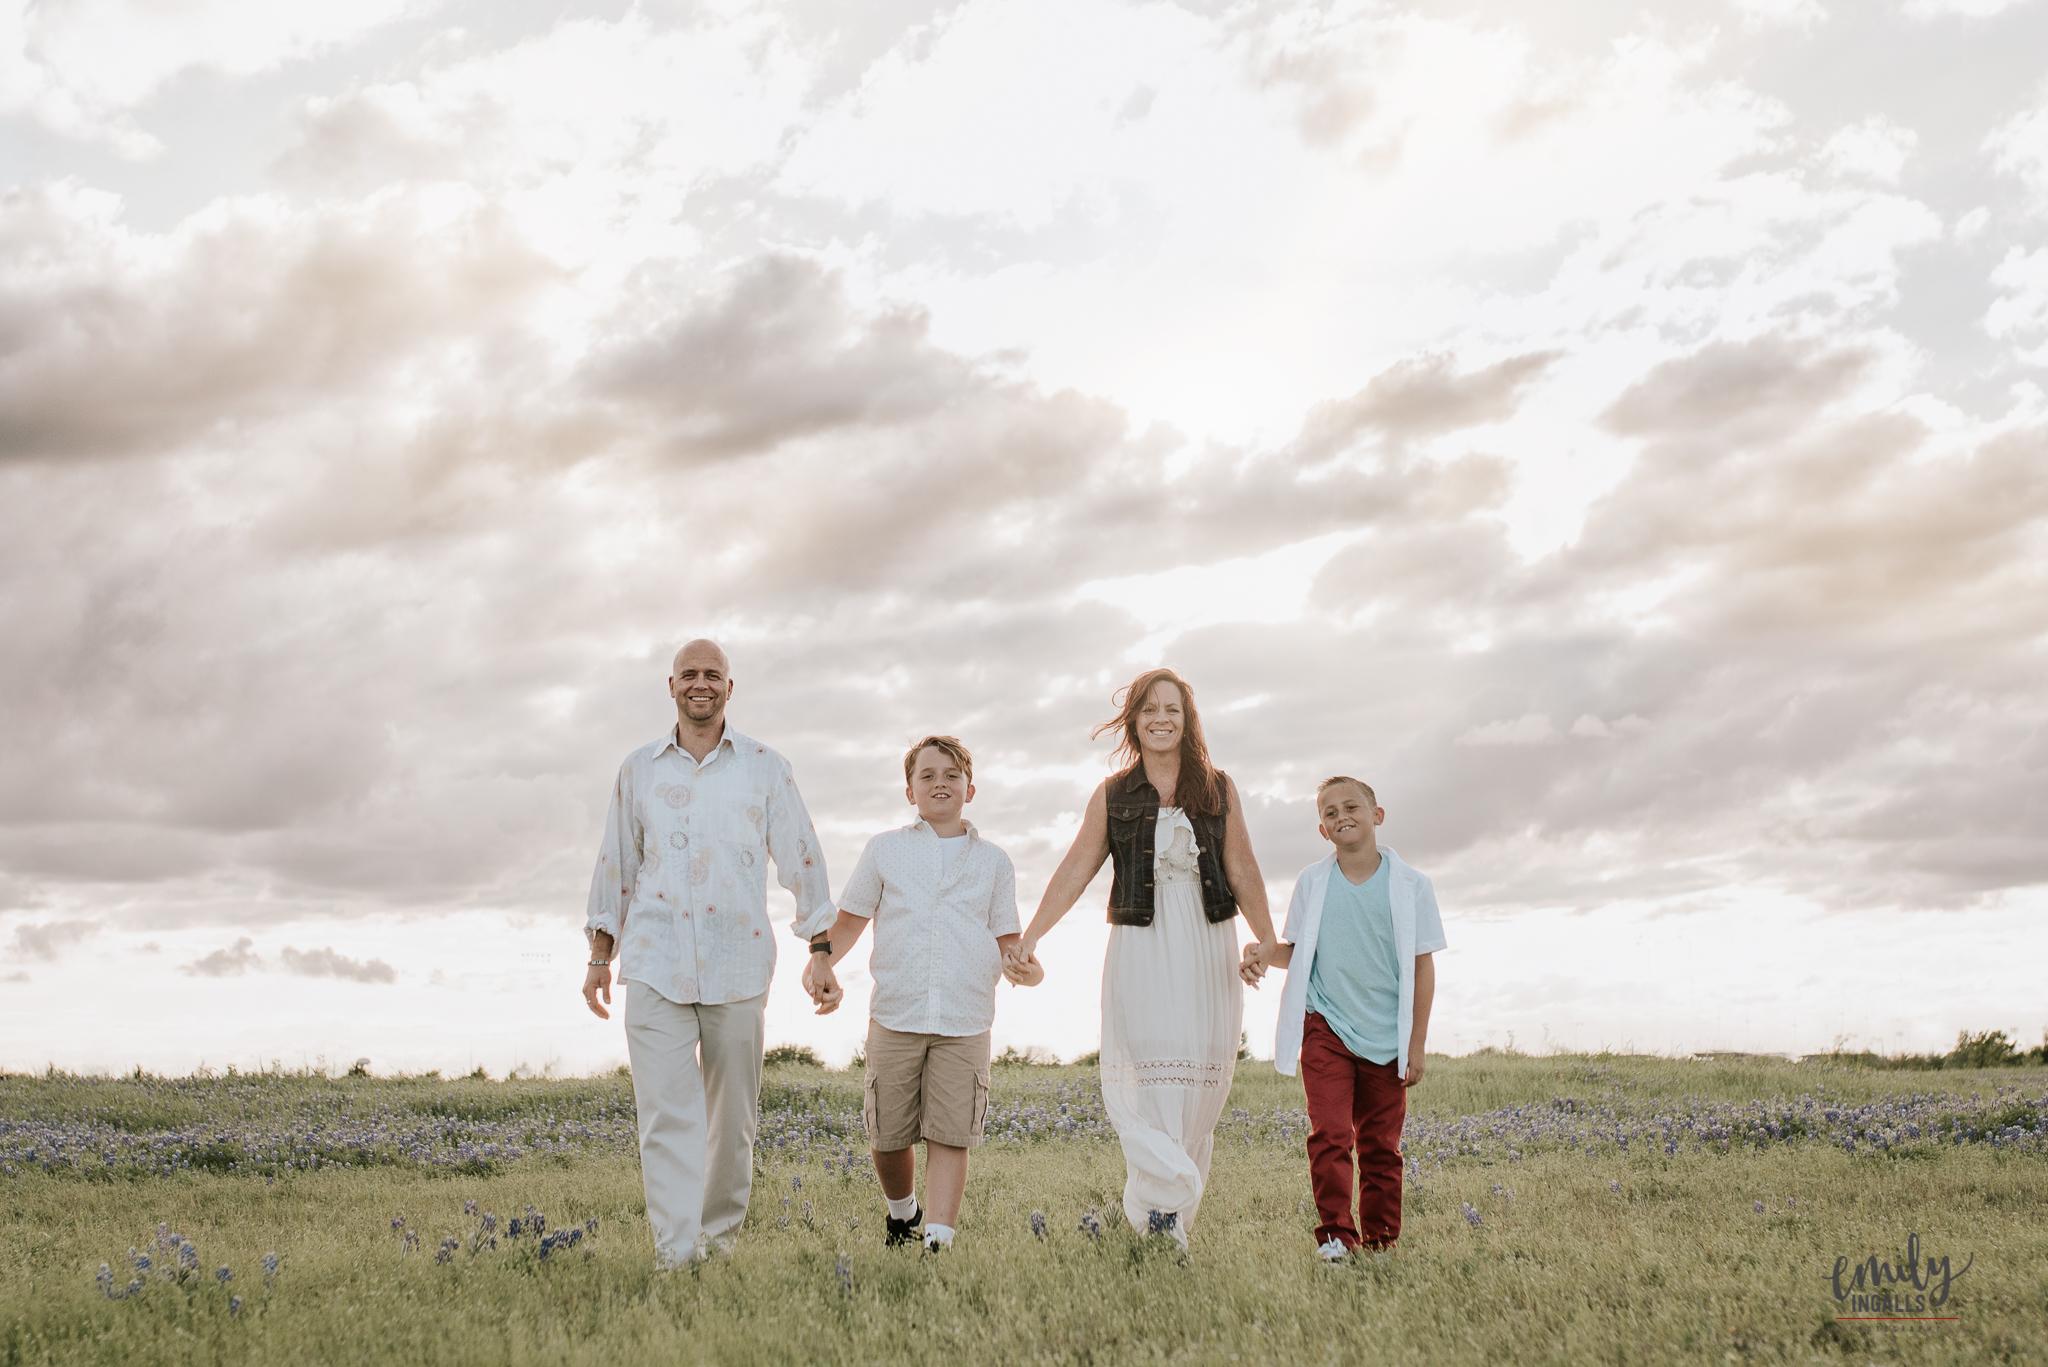 Family Photographer_Round Rock Photographer_Emily Ingalls Photography_Austin Photographer_Pflugerville Family Photographer-10.jpg